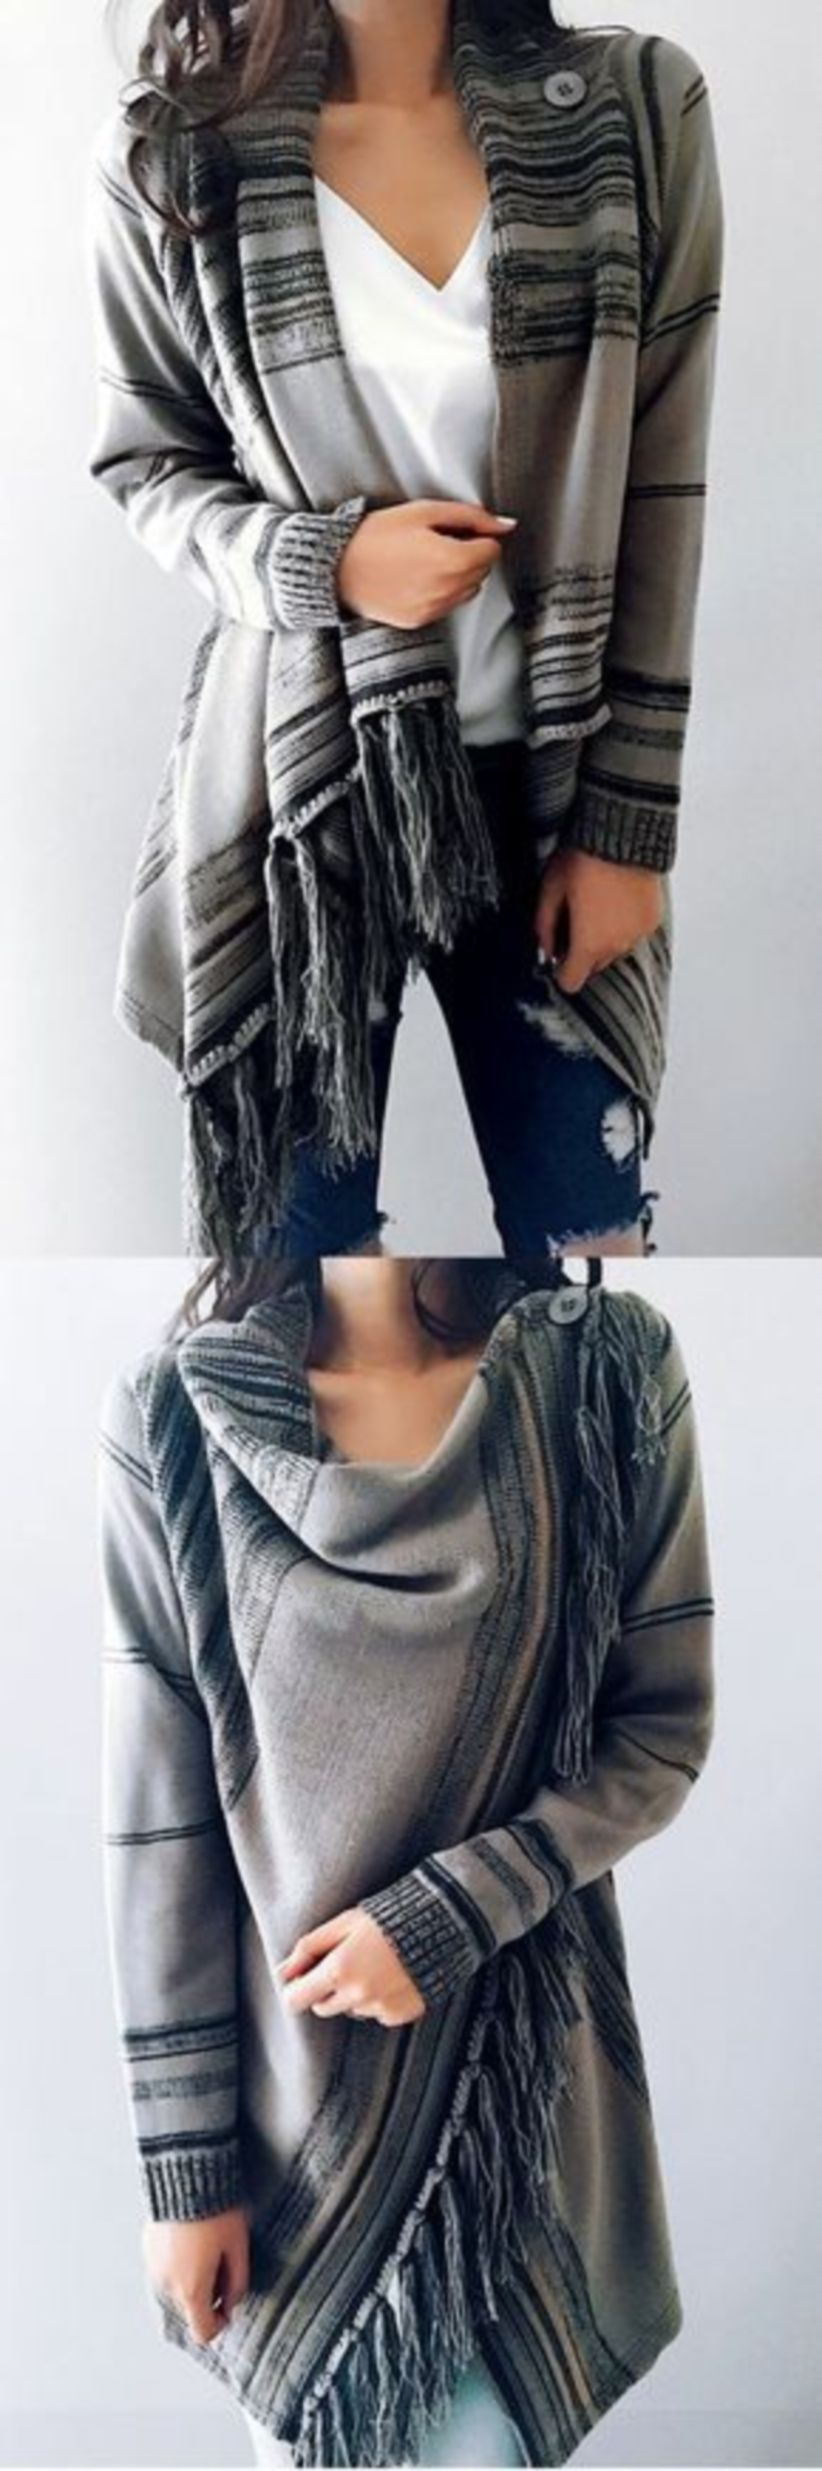 MiraDuma   Fashion, Fashion outfits, Outfits